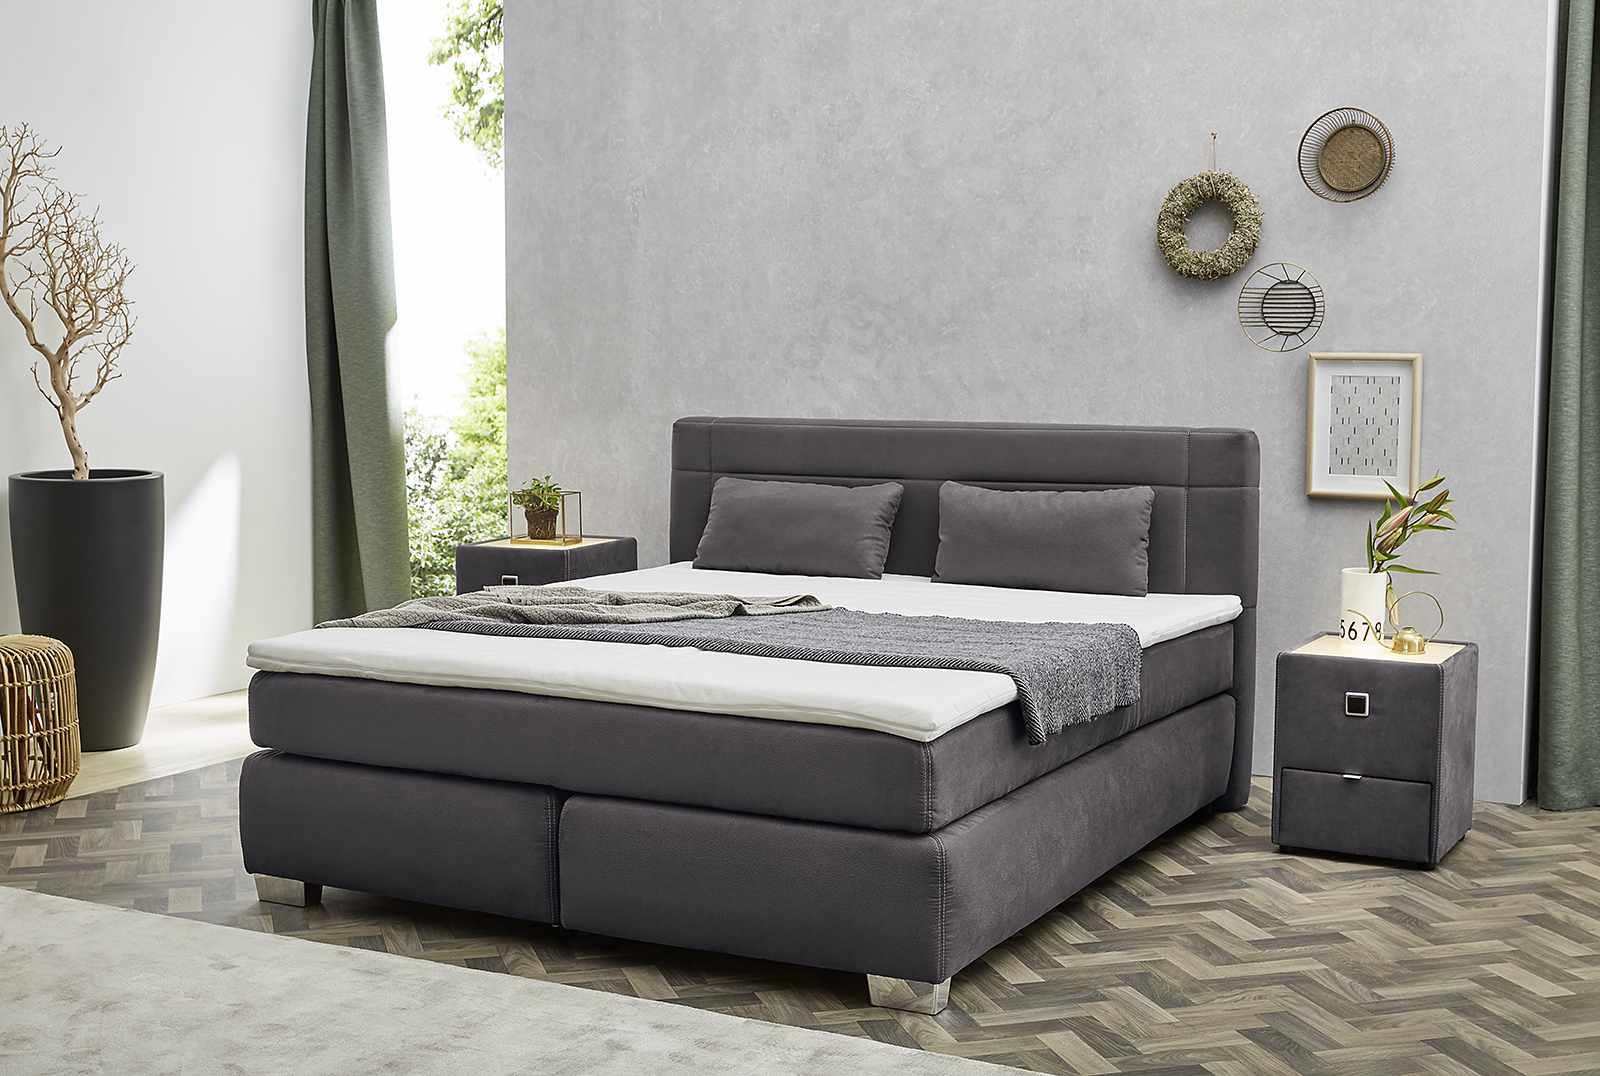 boxspringbett romana mix boxspringbetten boxspring sortiment pack zu m bel sb und k chen. Black Bedroom Furniture Sets. Home Design Ideas